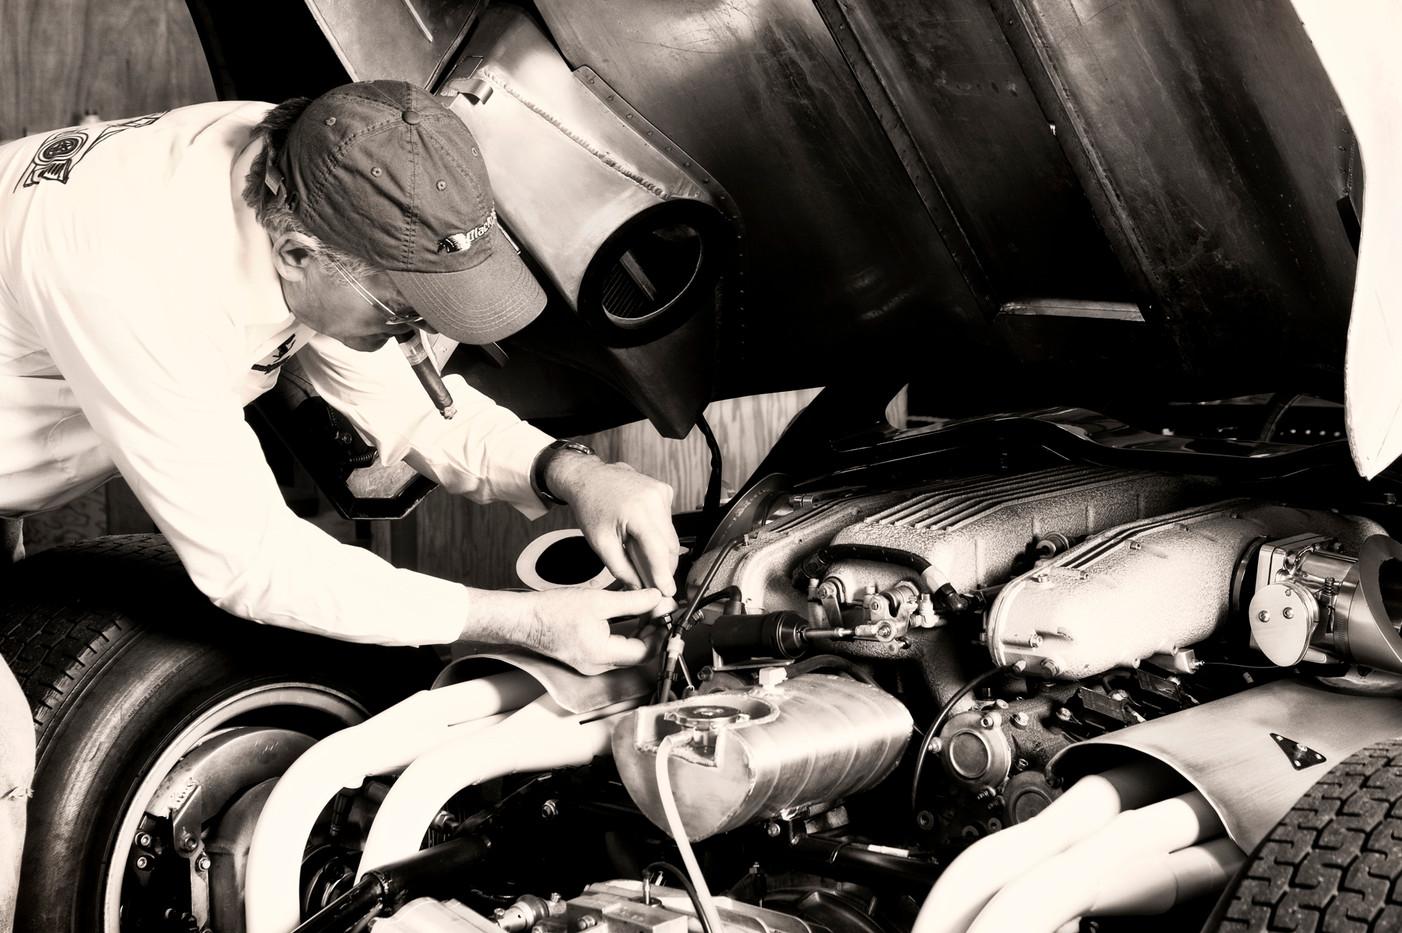 morgan_vintage cars_photography 3.jpg